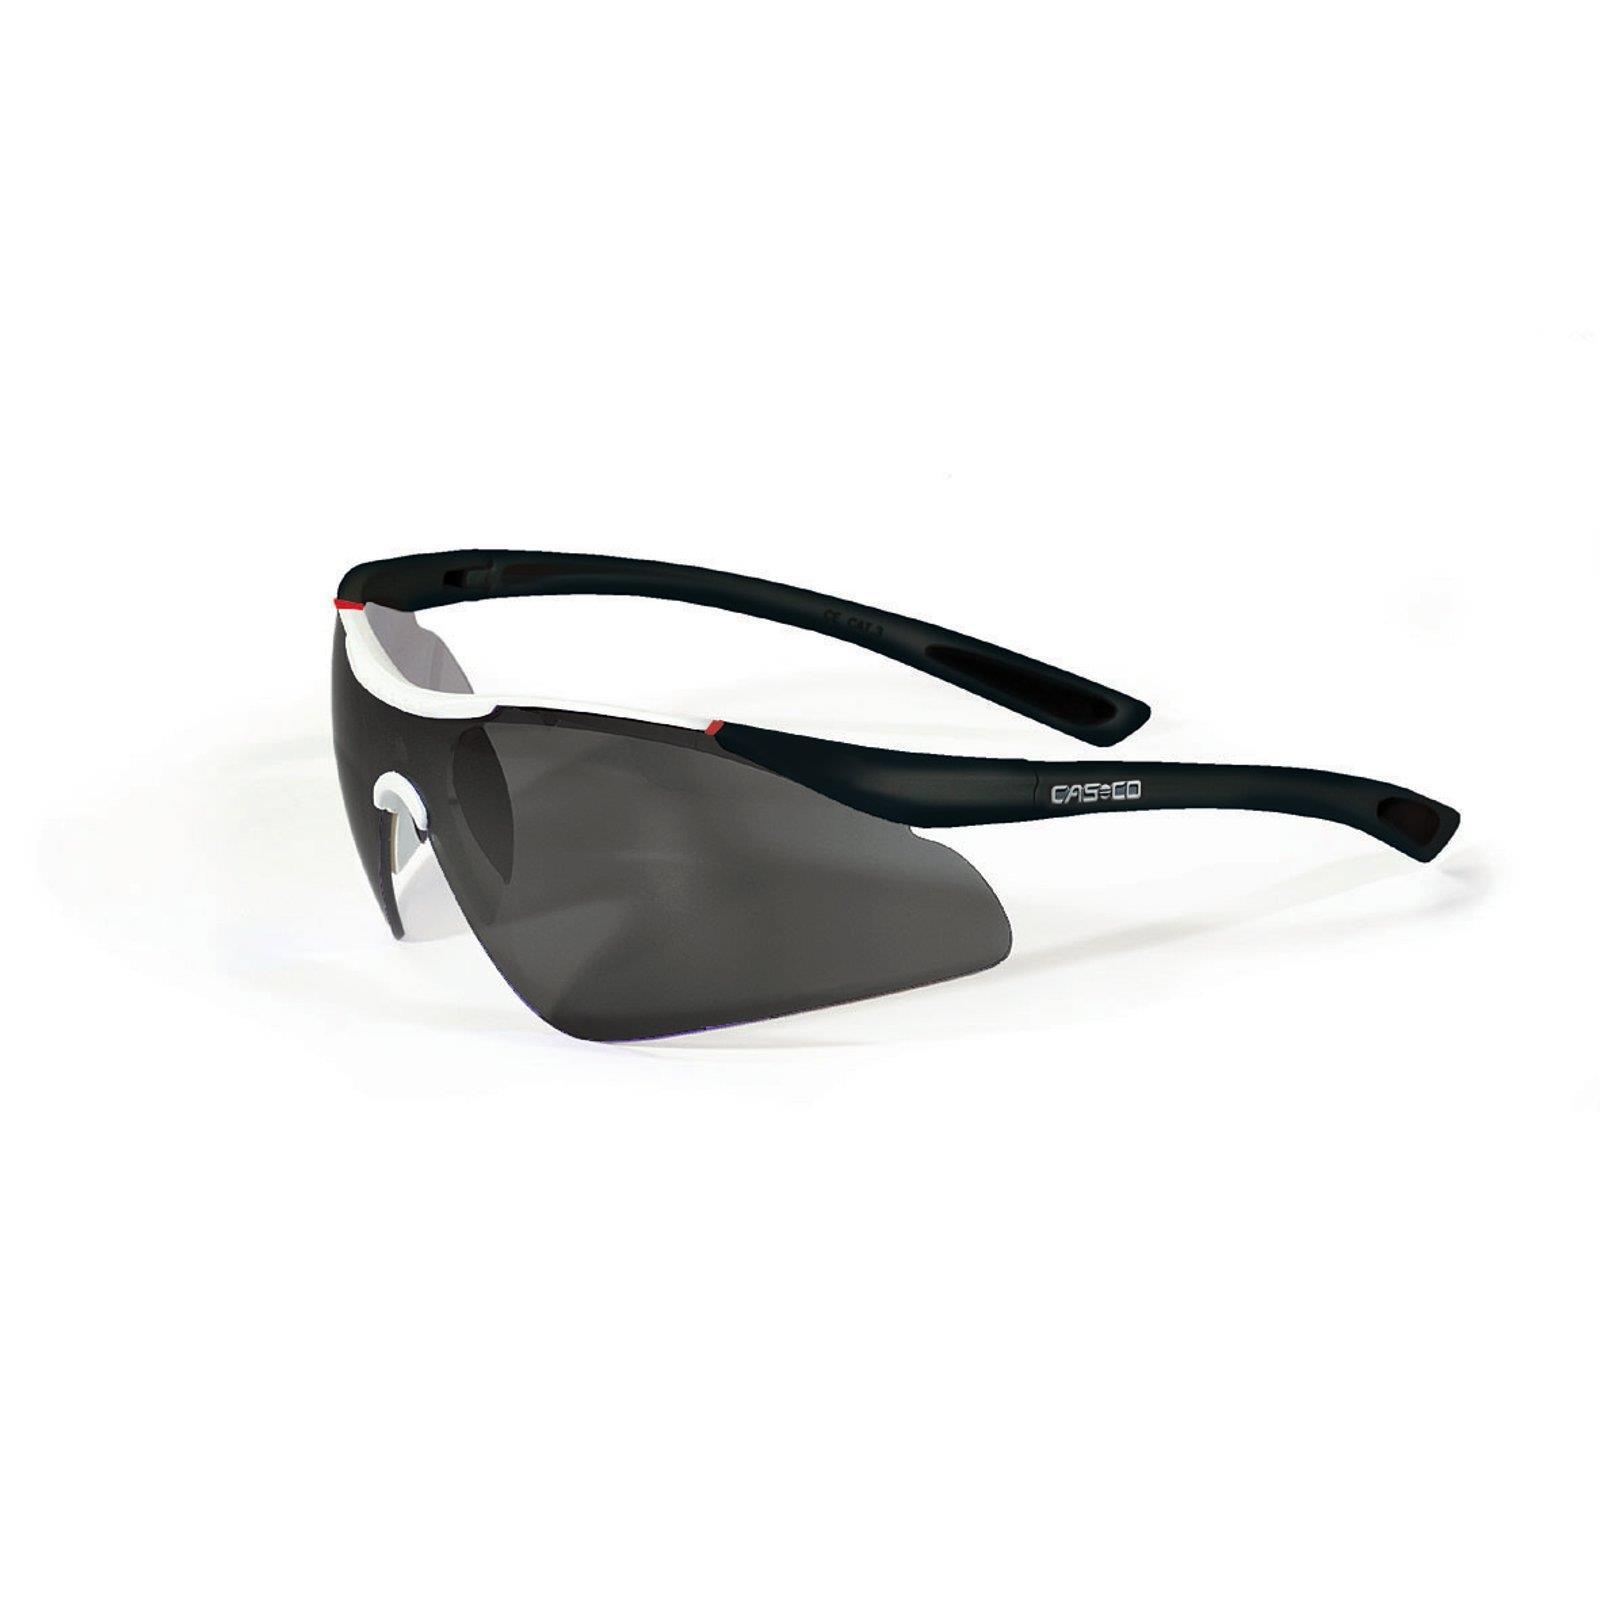 casco sportbrille sx 30 polarized sonnenbrille fahrrad brille rennrad road bike ebay. Black Bedroom Furniture Sets. Home Design Ideas